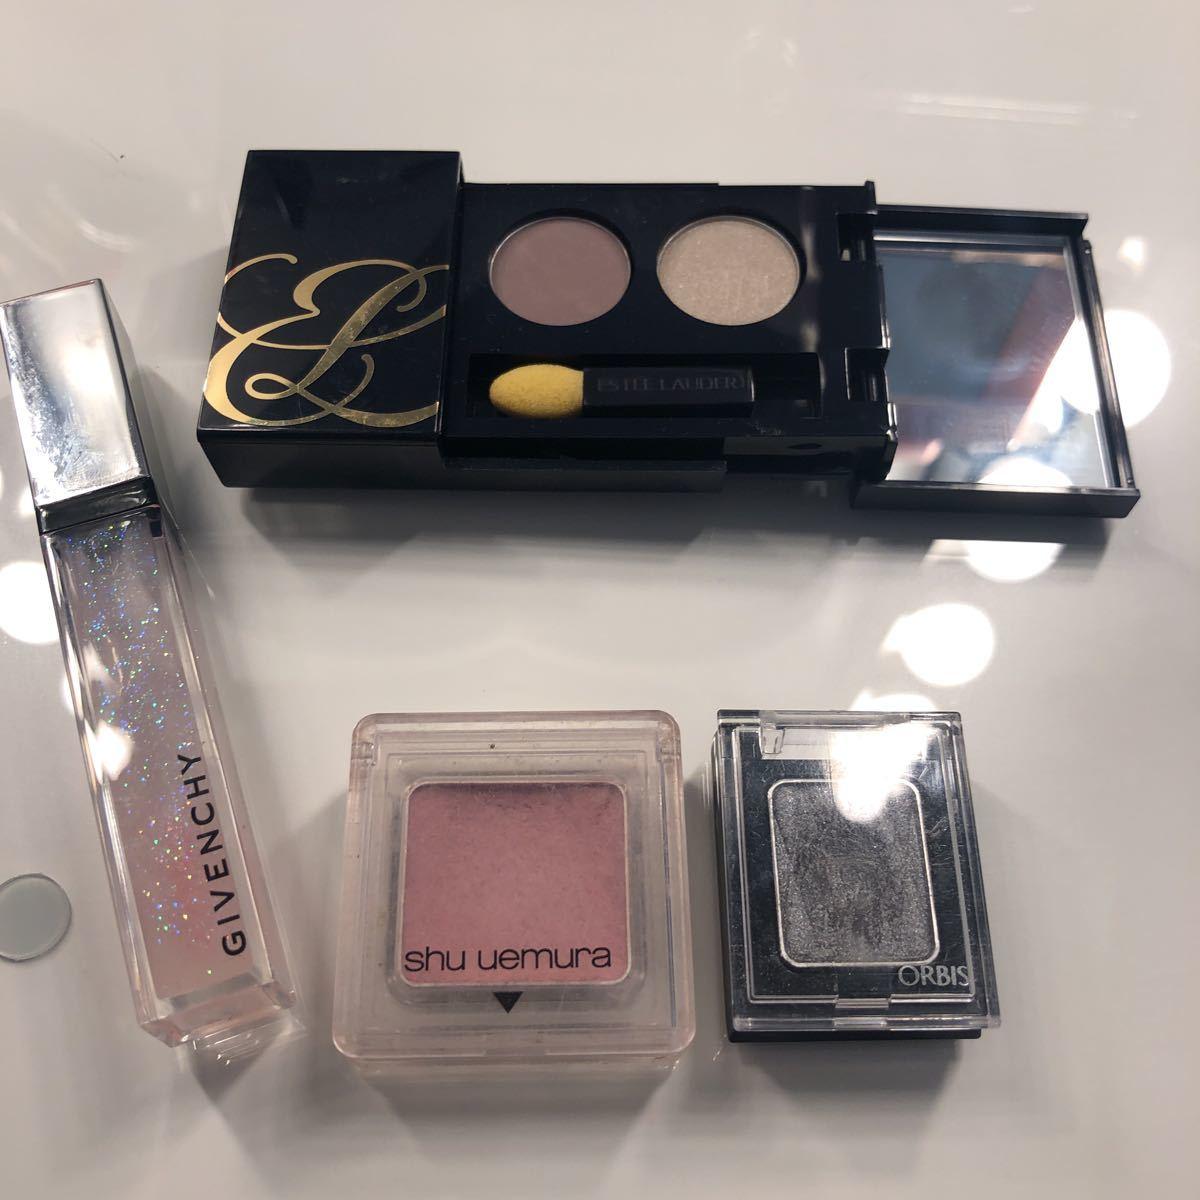 Shu Uemura estilo -da- Givenchy Orbis eyeshadow gloss tepakos set cosme